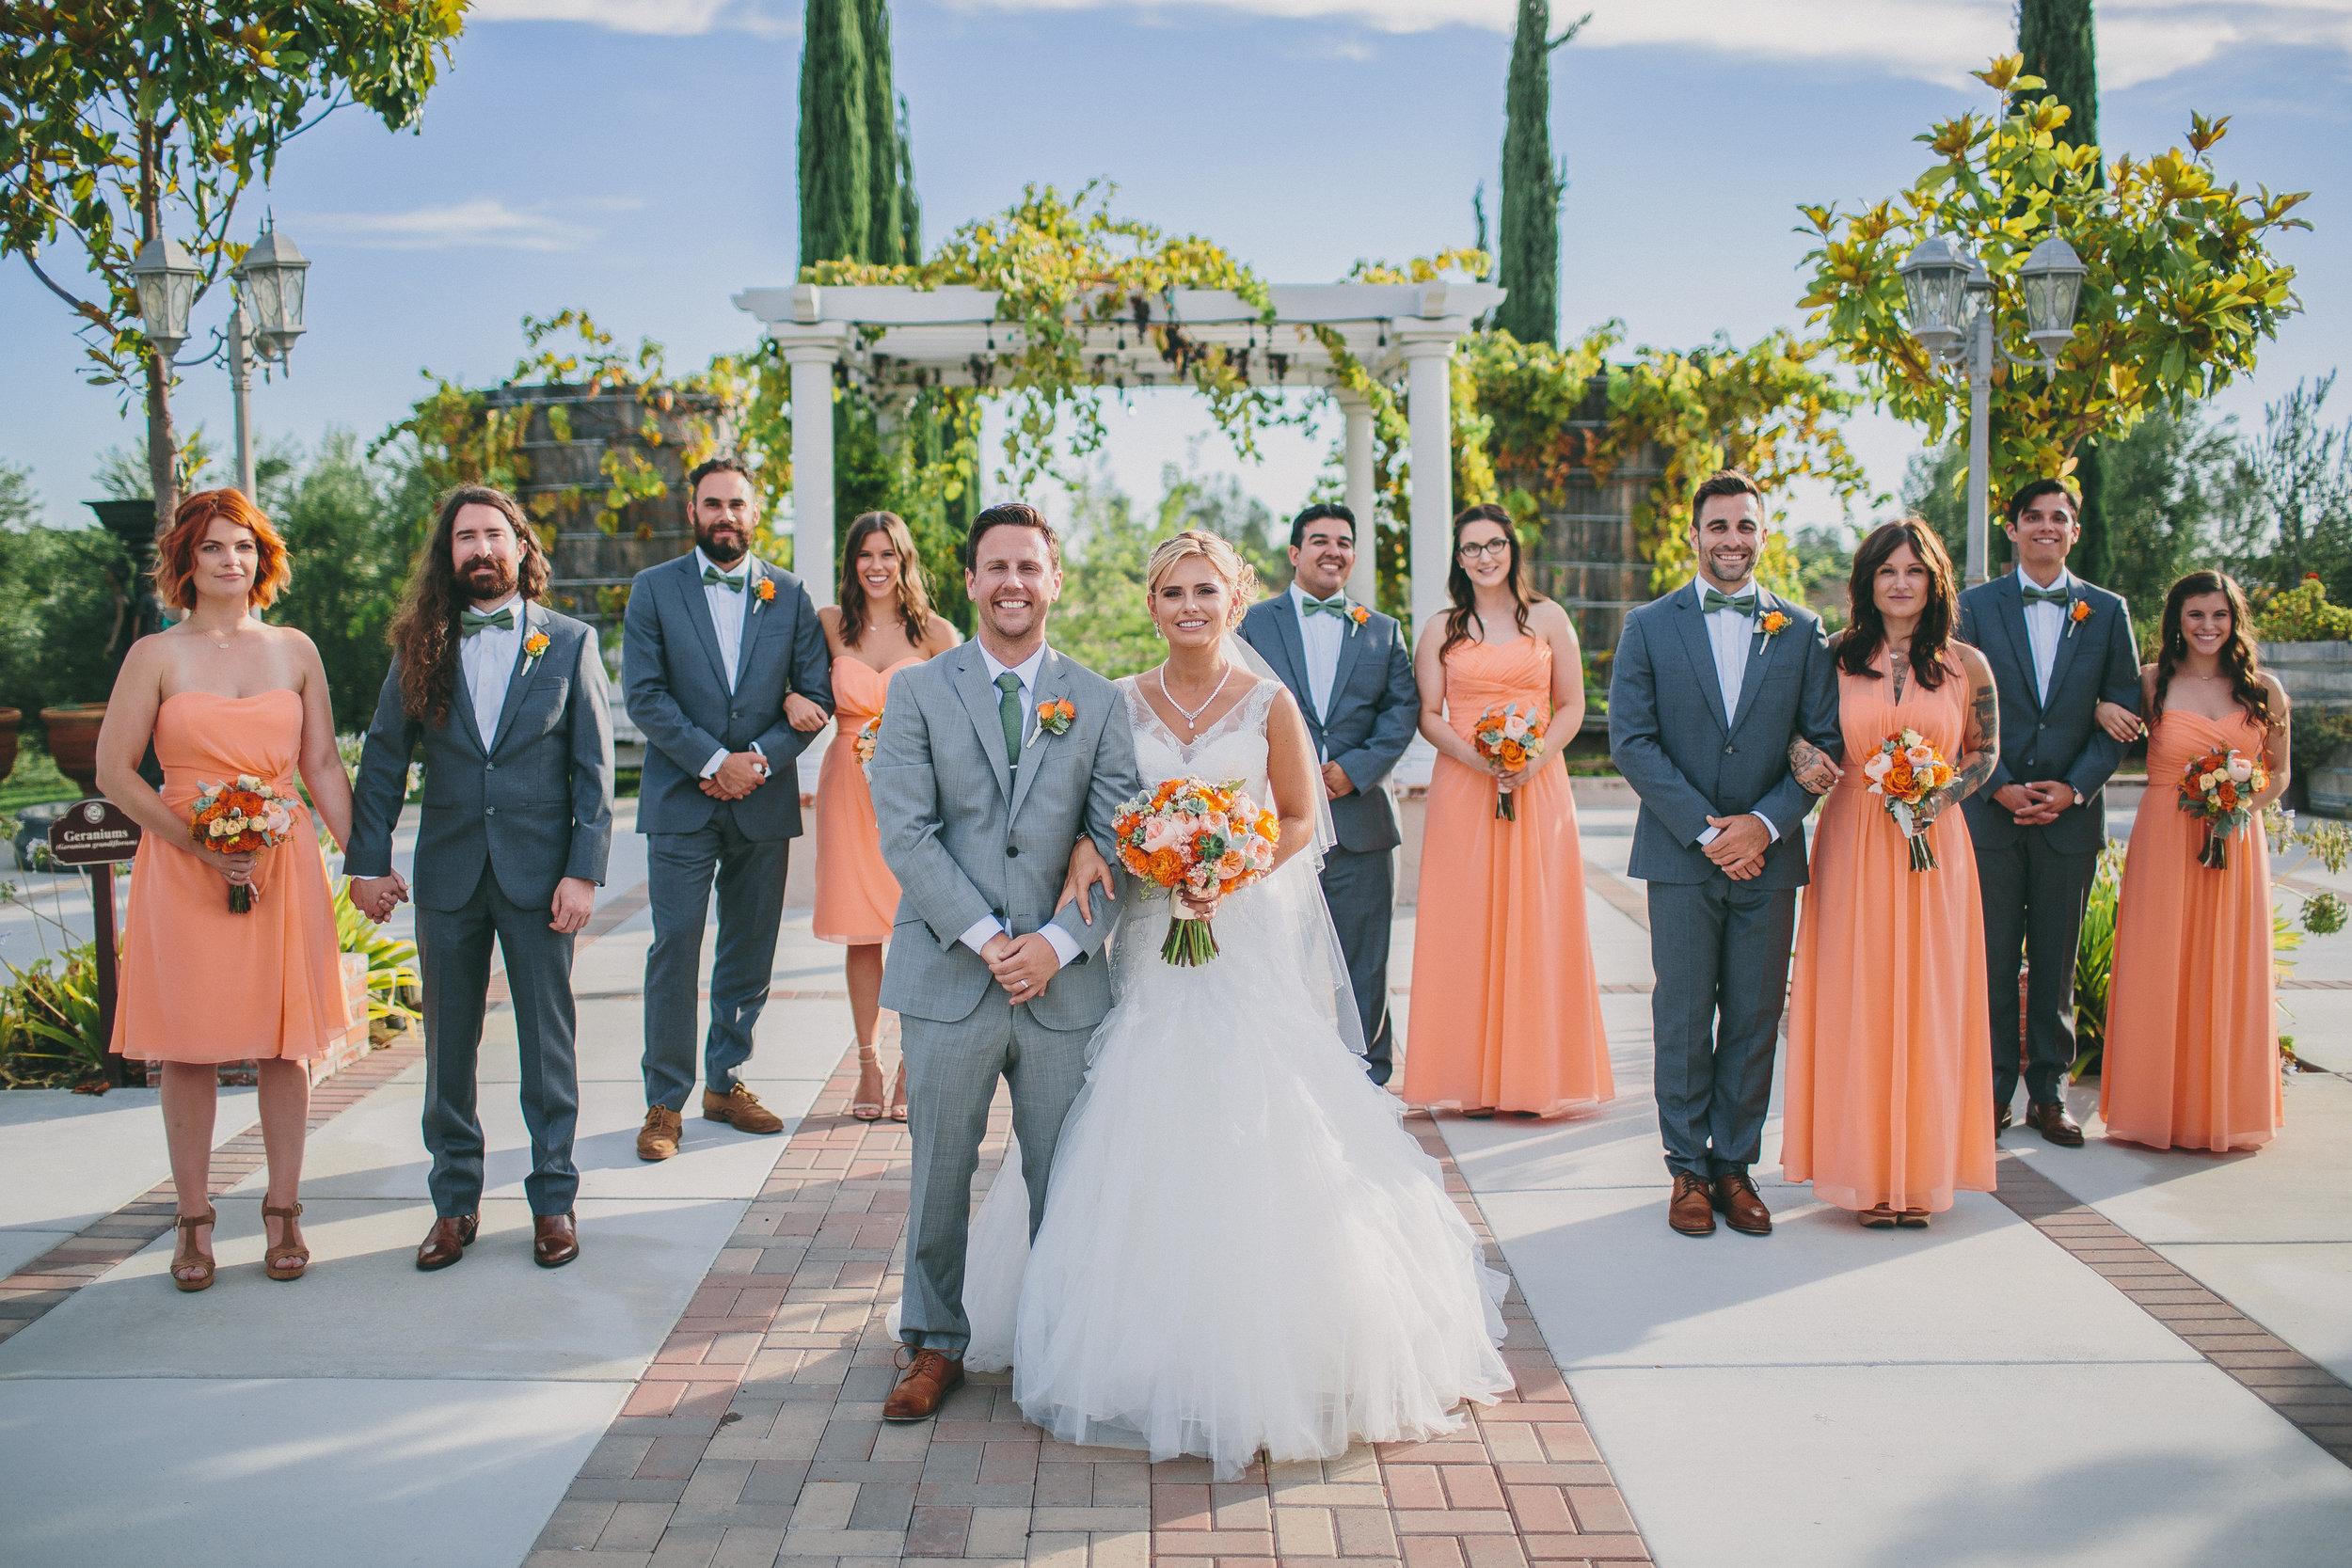 Romantic Mount Palomar Winery Wedding | Michelle Garibay Events